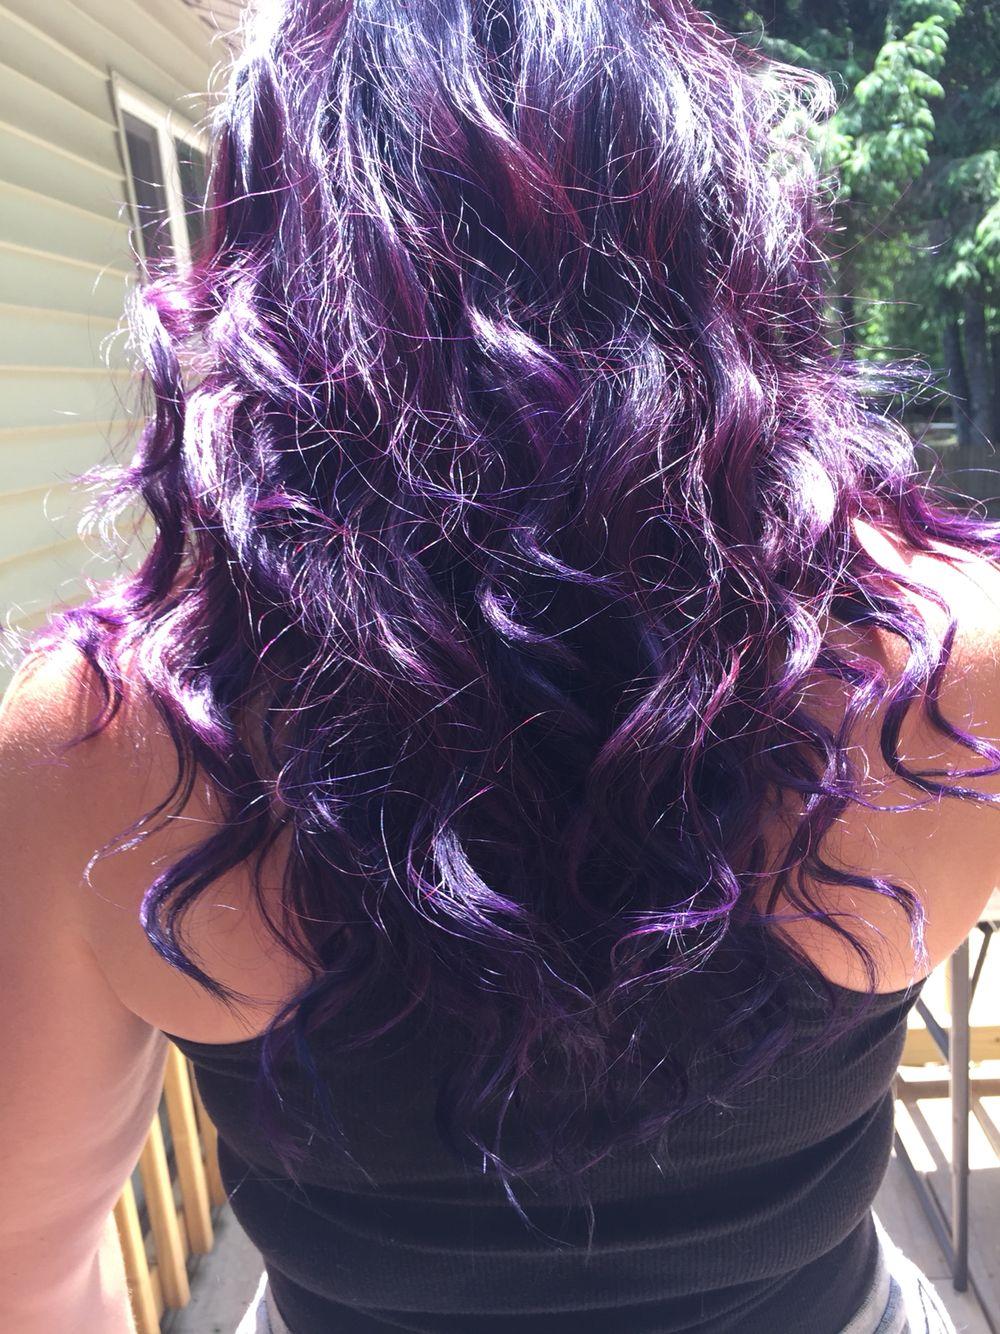 Purple Desire By Splat On Unbleached Dark Hair Splat Hair Dye Splat Purple Hair Dye Dyed Hair